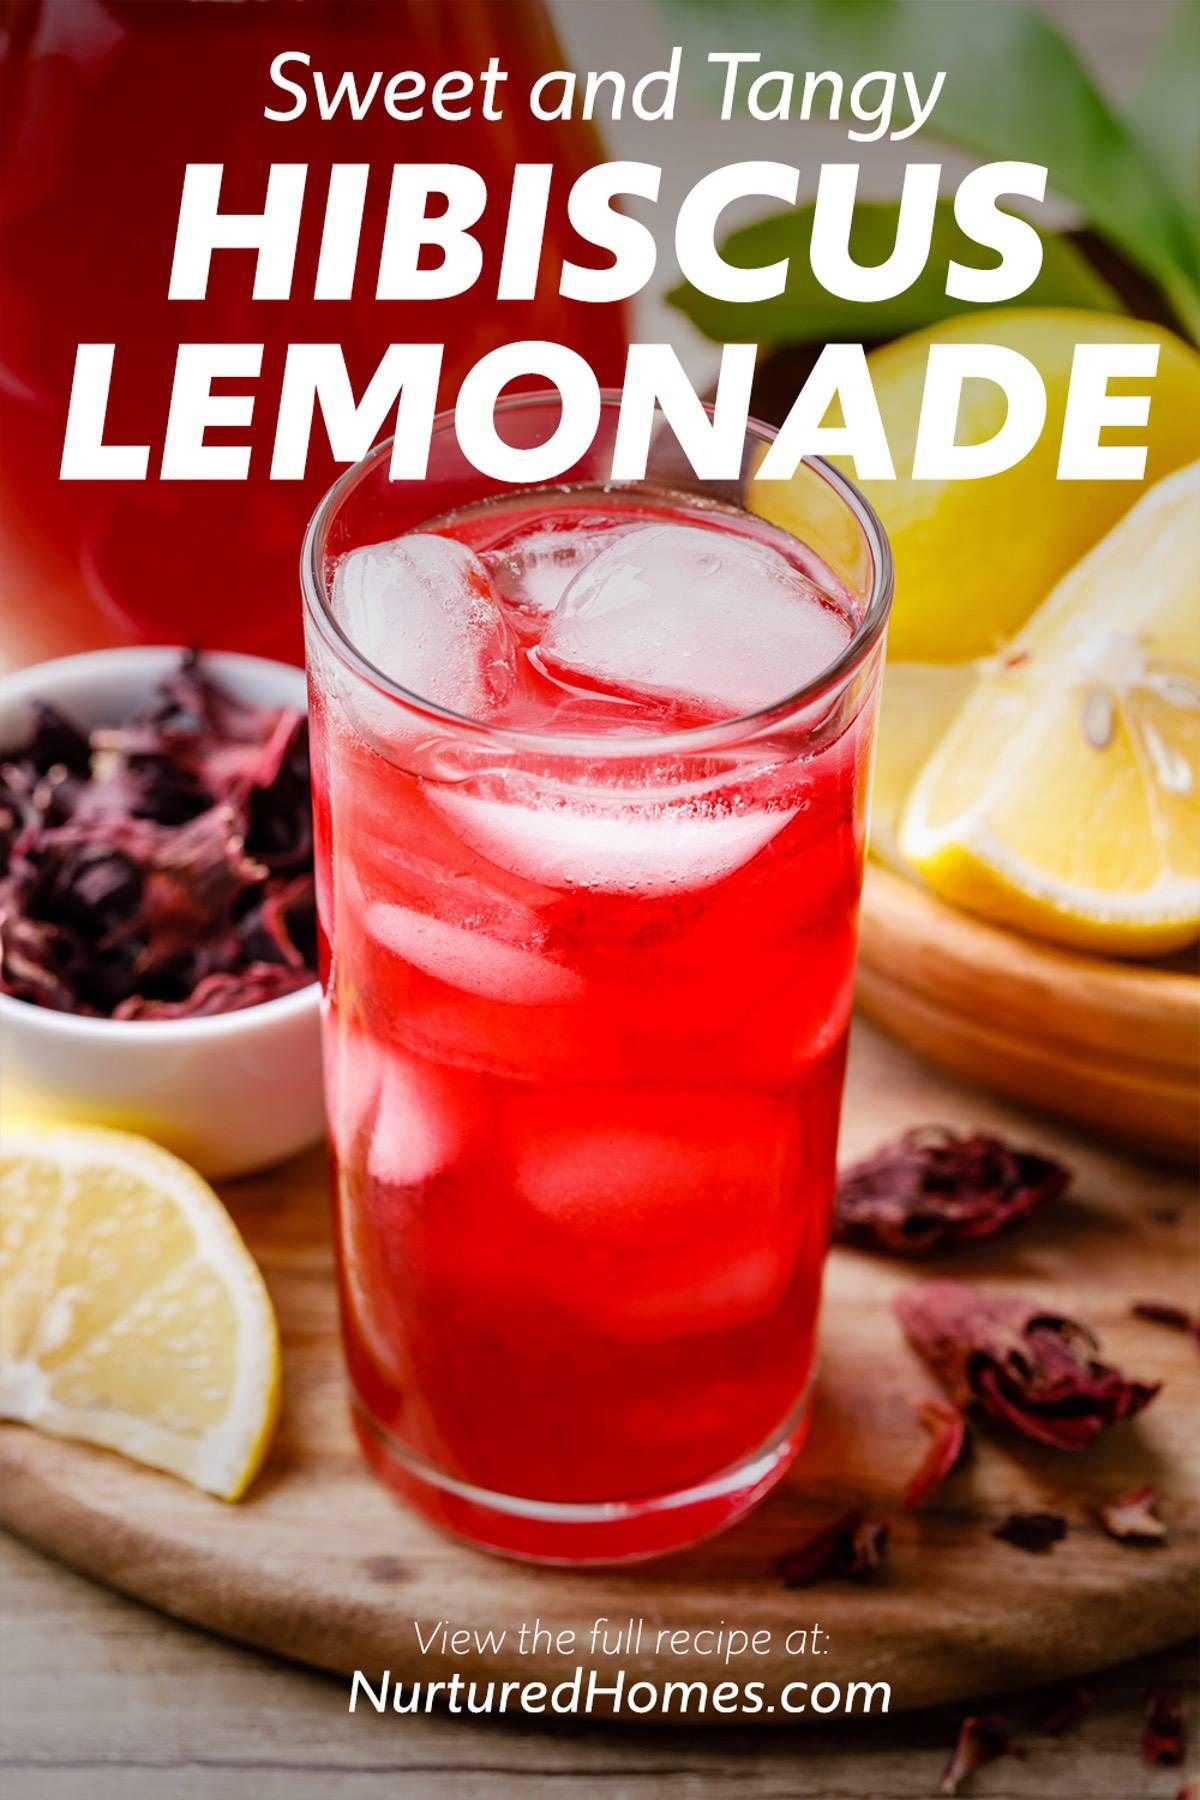 Sweet And Tangy Hibiscus Lemonade Easy Recipe Nurtured Homes Recipe In 2020 Hibiscus Juice Recipe Hibiscus Drink Recipe Healthy Refreshing Drinks